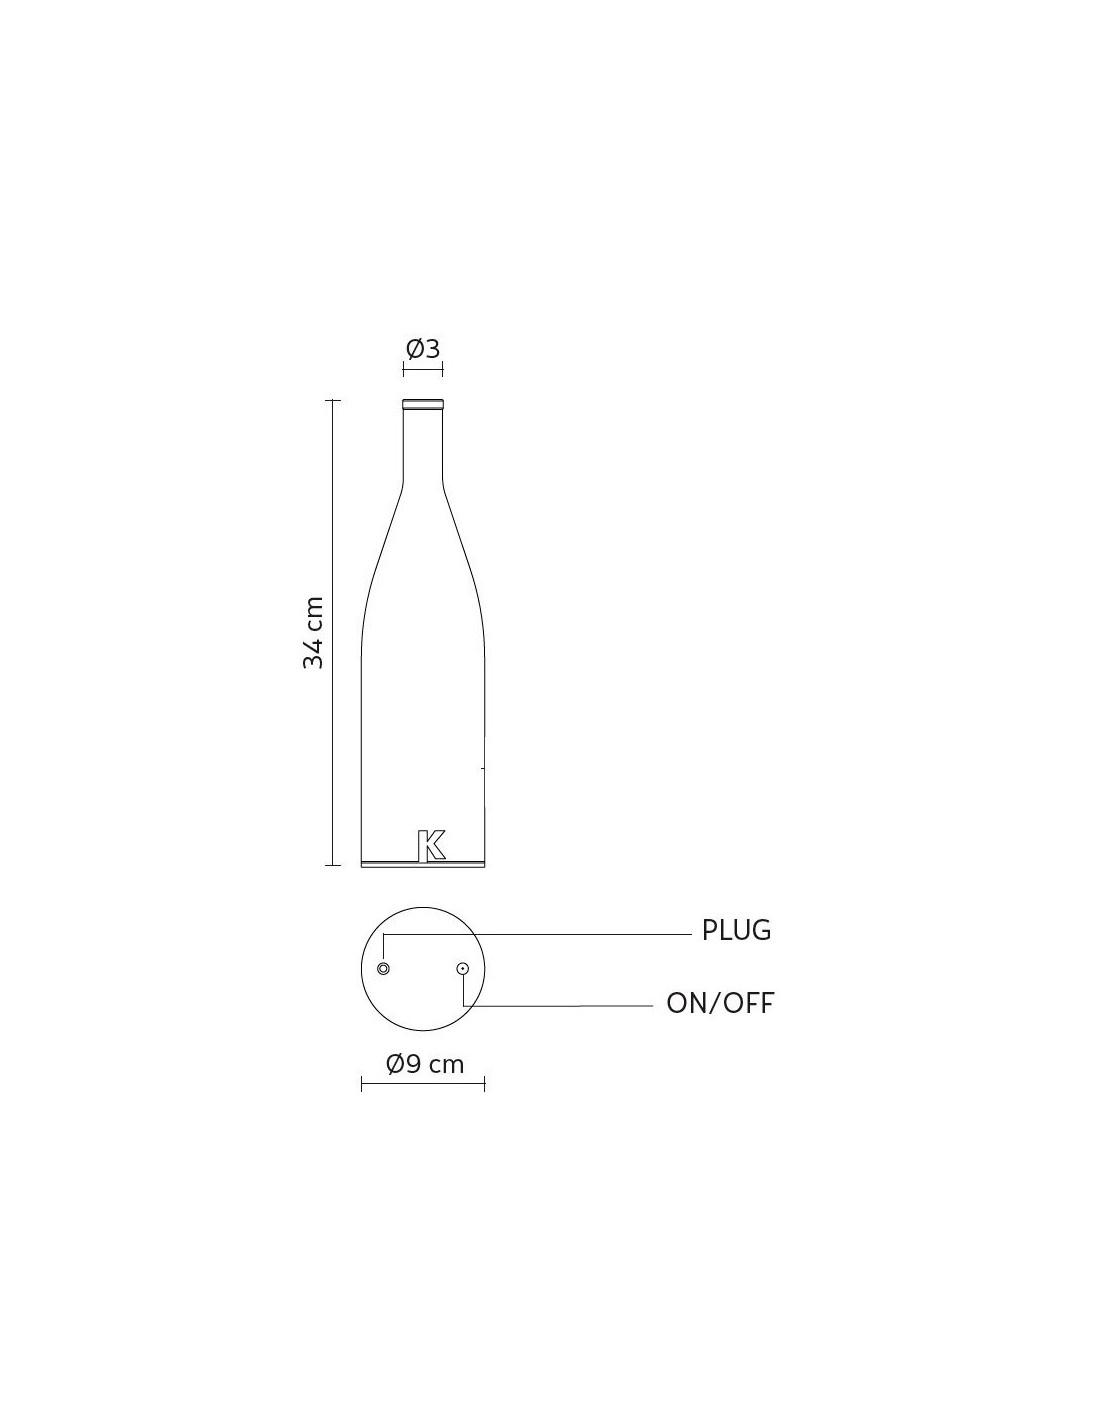 lampe poser sans fil bacco plan dimensions de chez karman. Black Bedroom Furniture Sets. Home Design Ideas